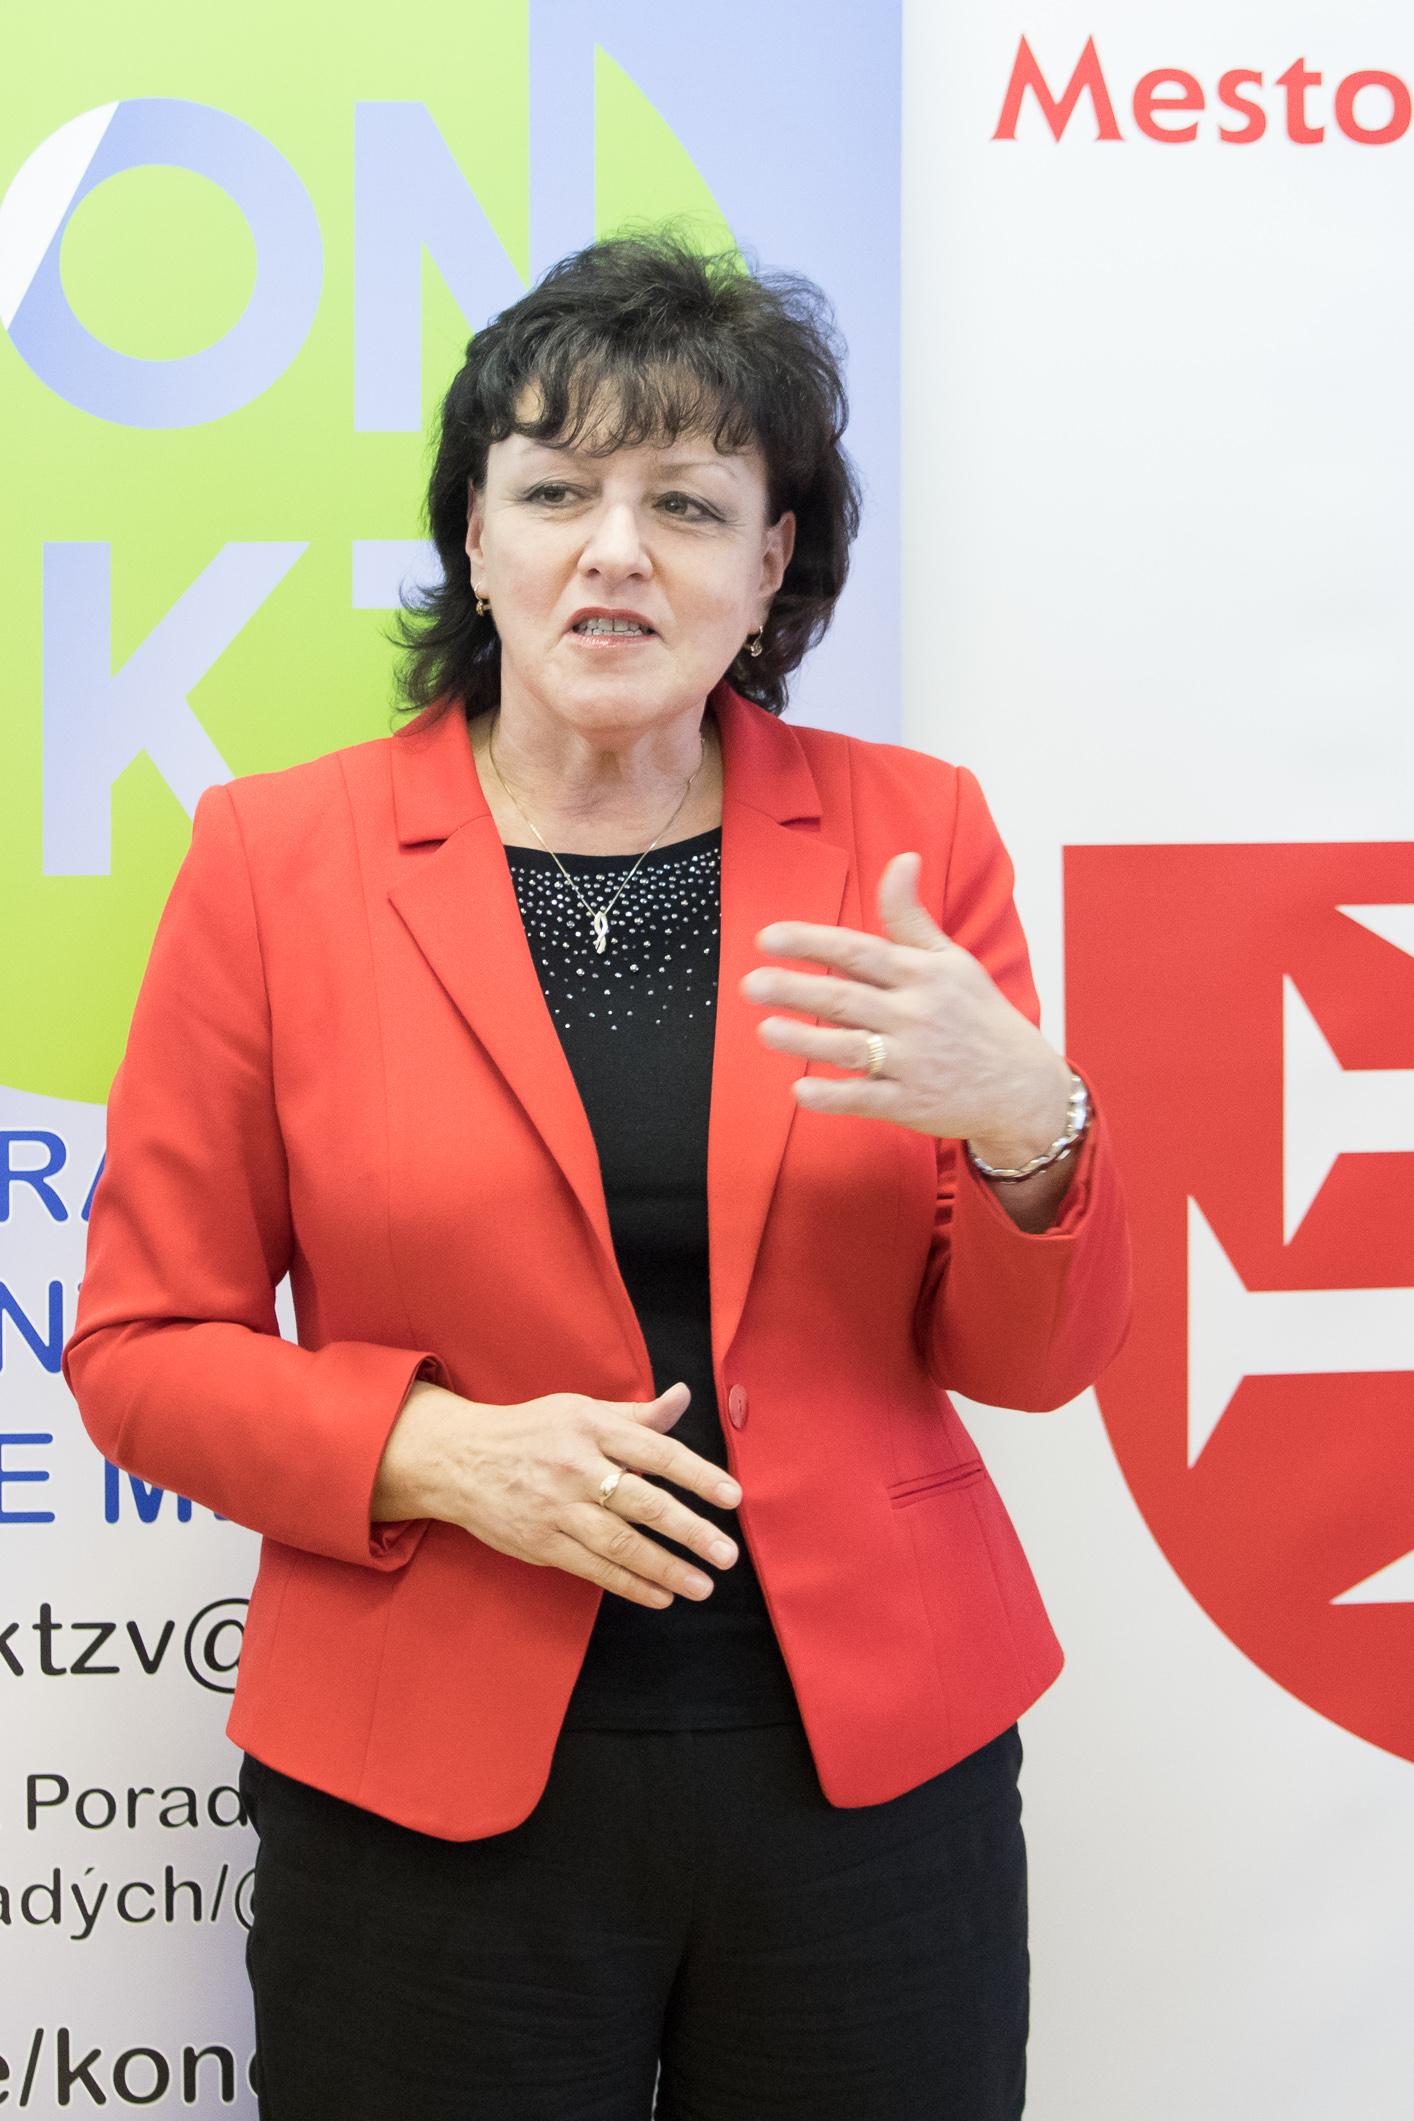 lenka-balkovicova-konekt